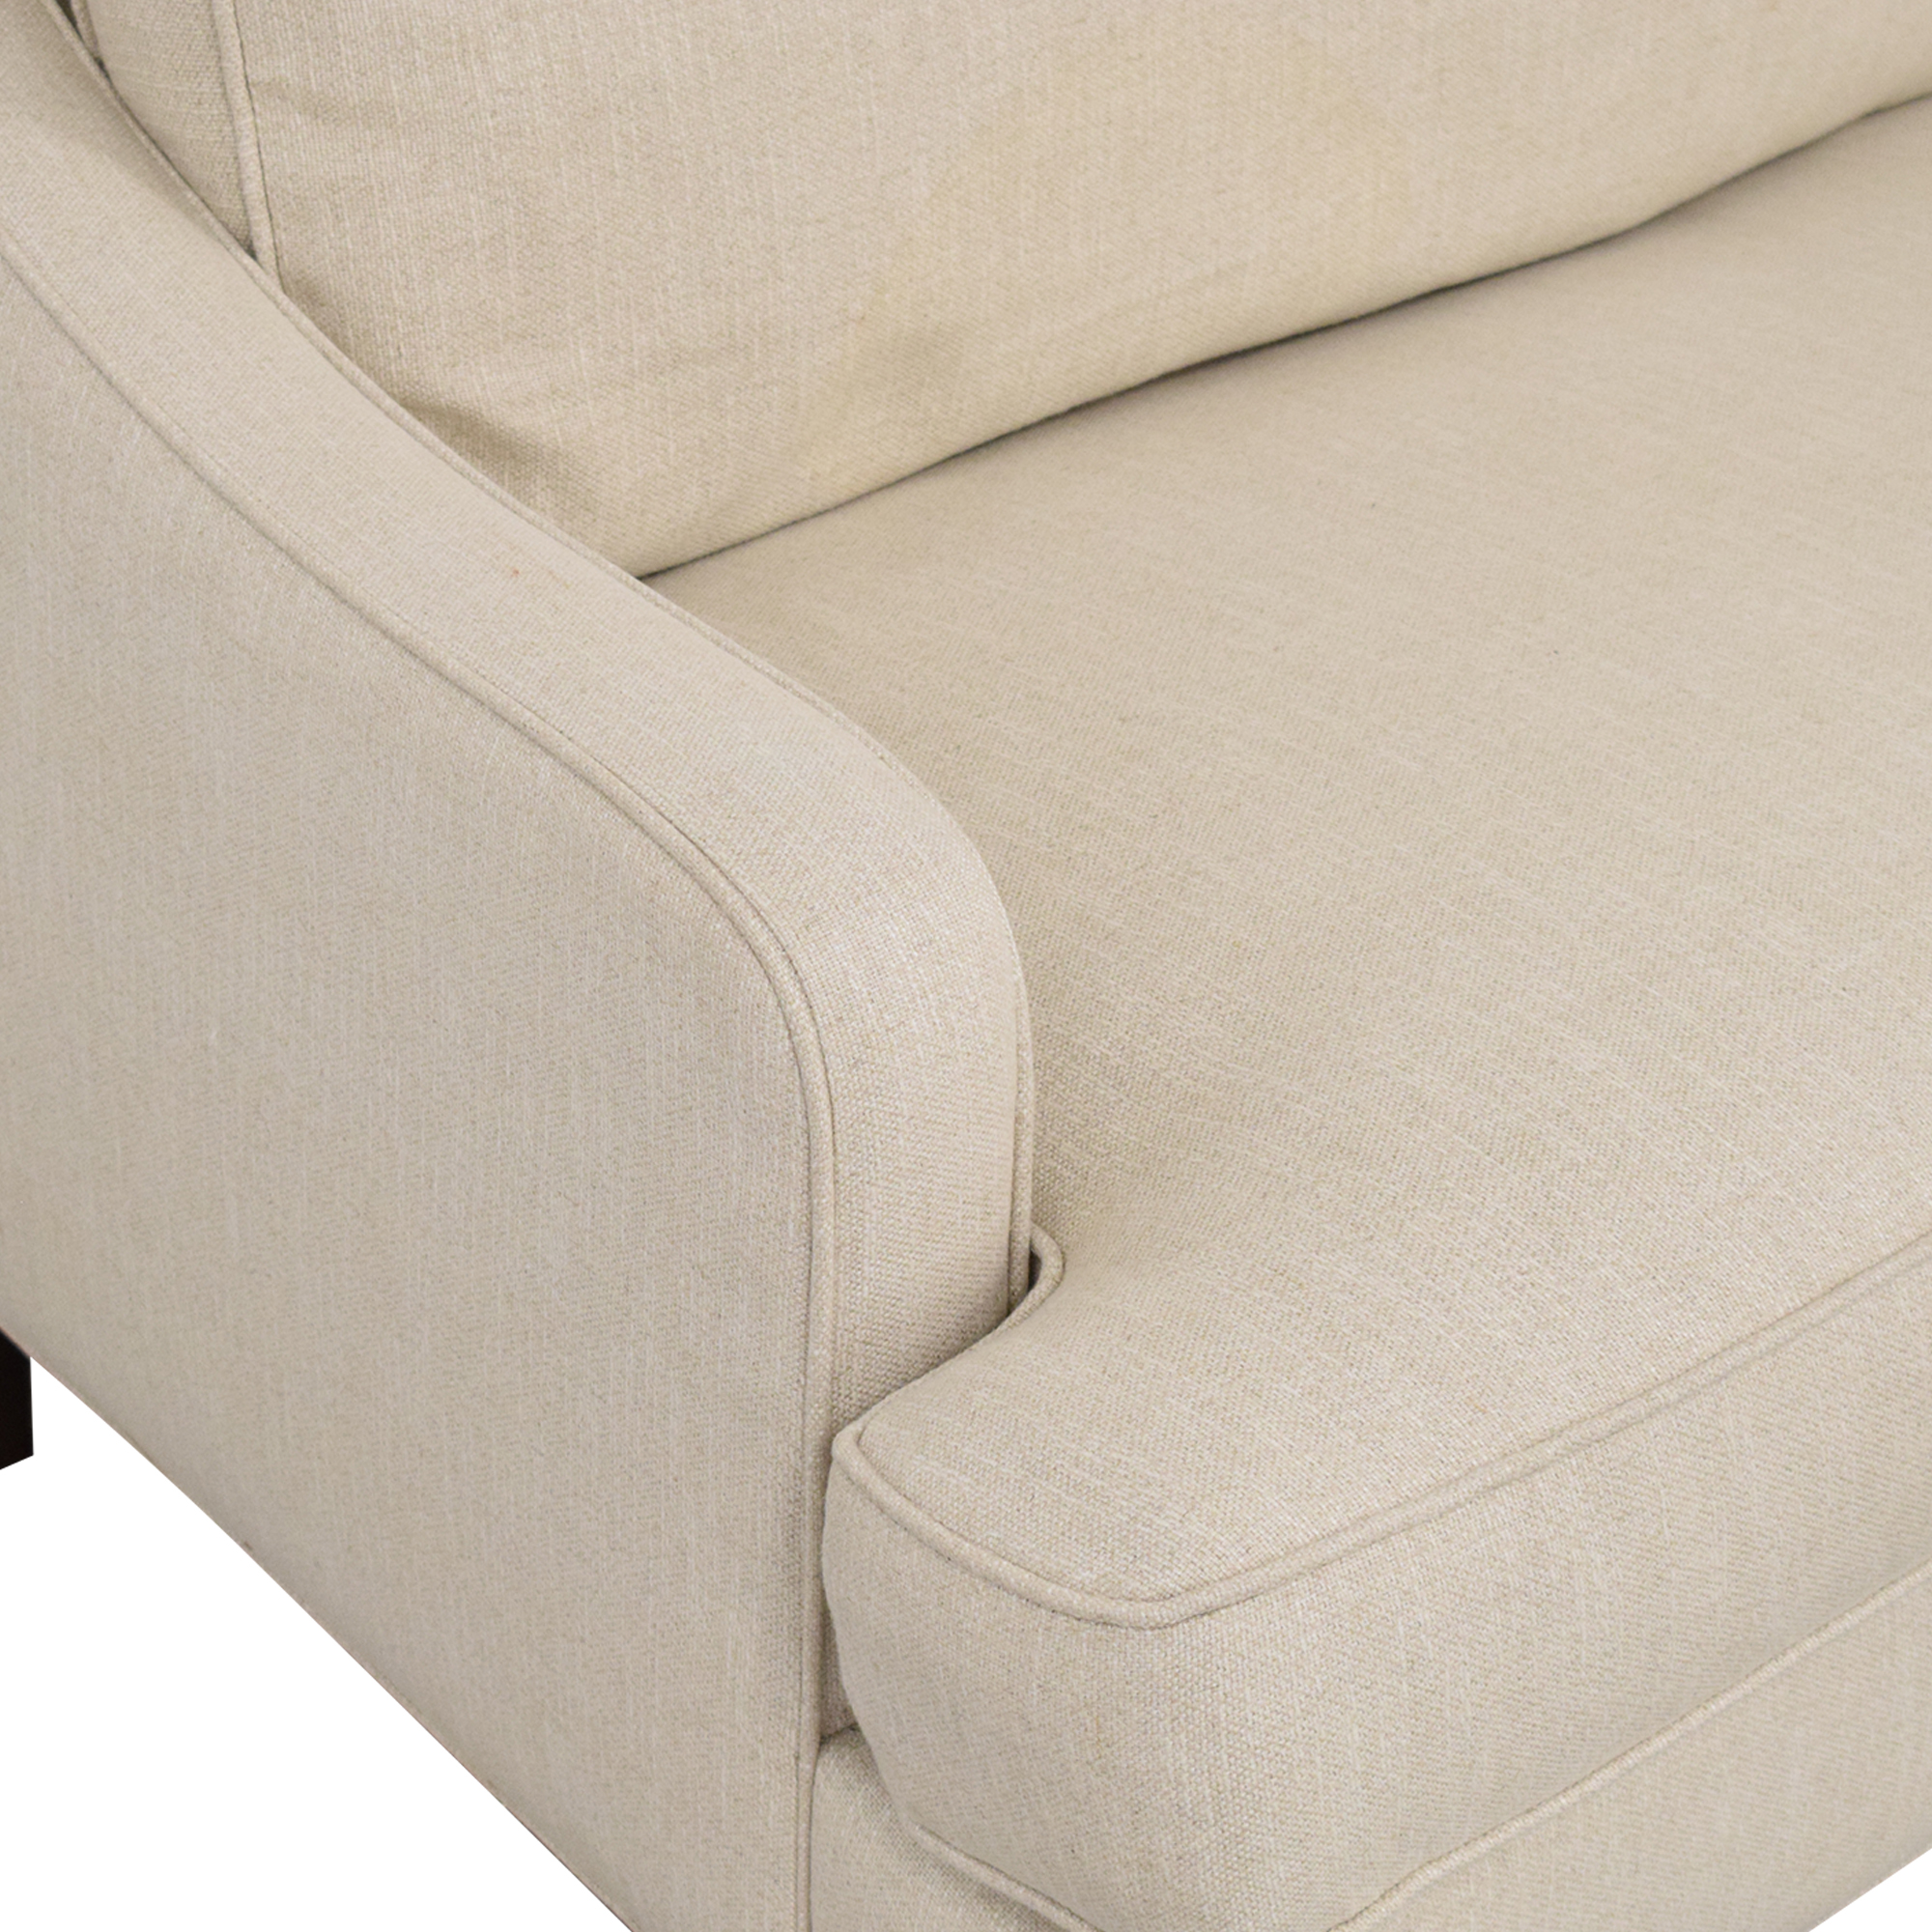 Pottery Barn Landon Two Cushion Sofa